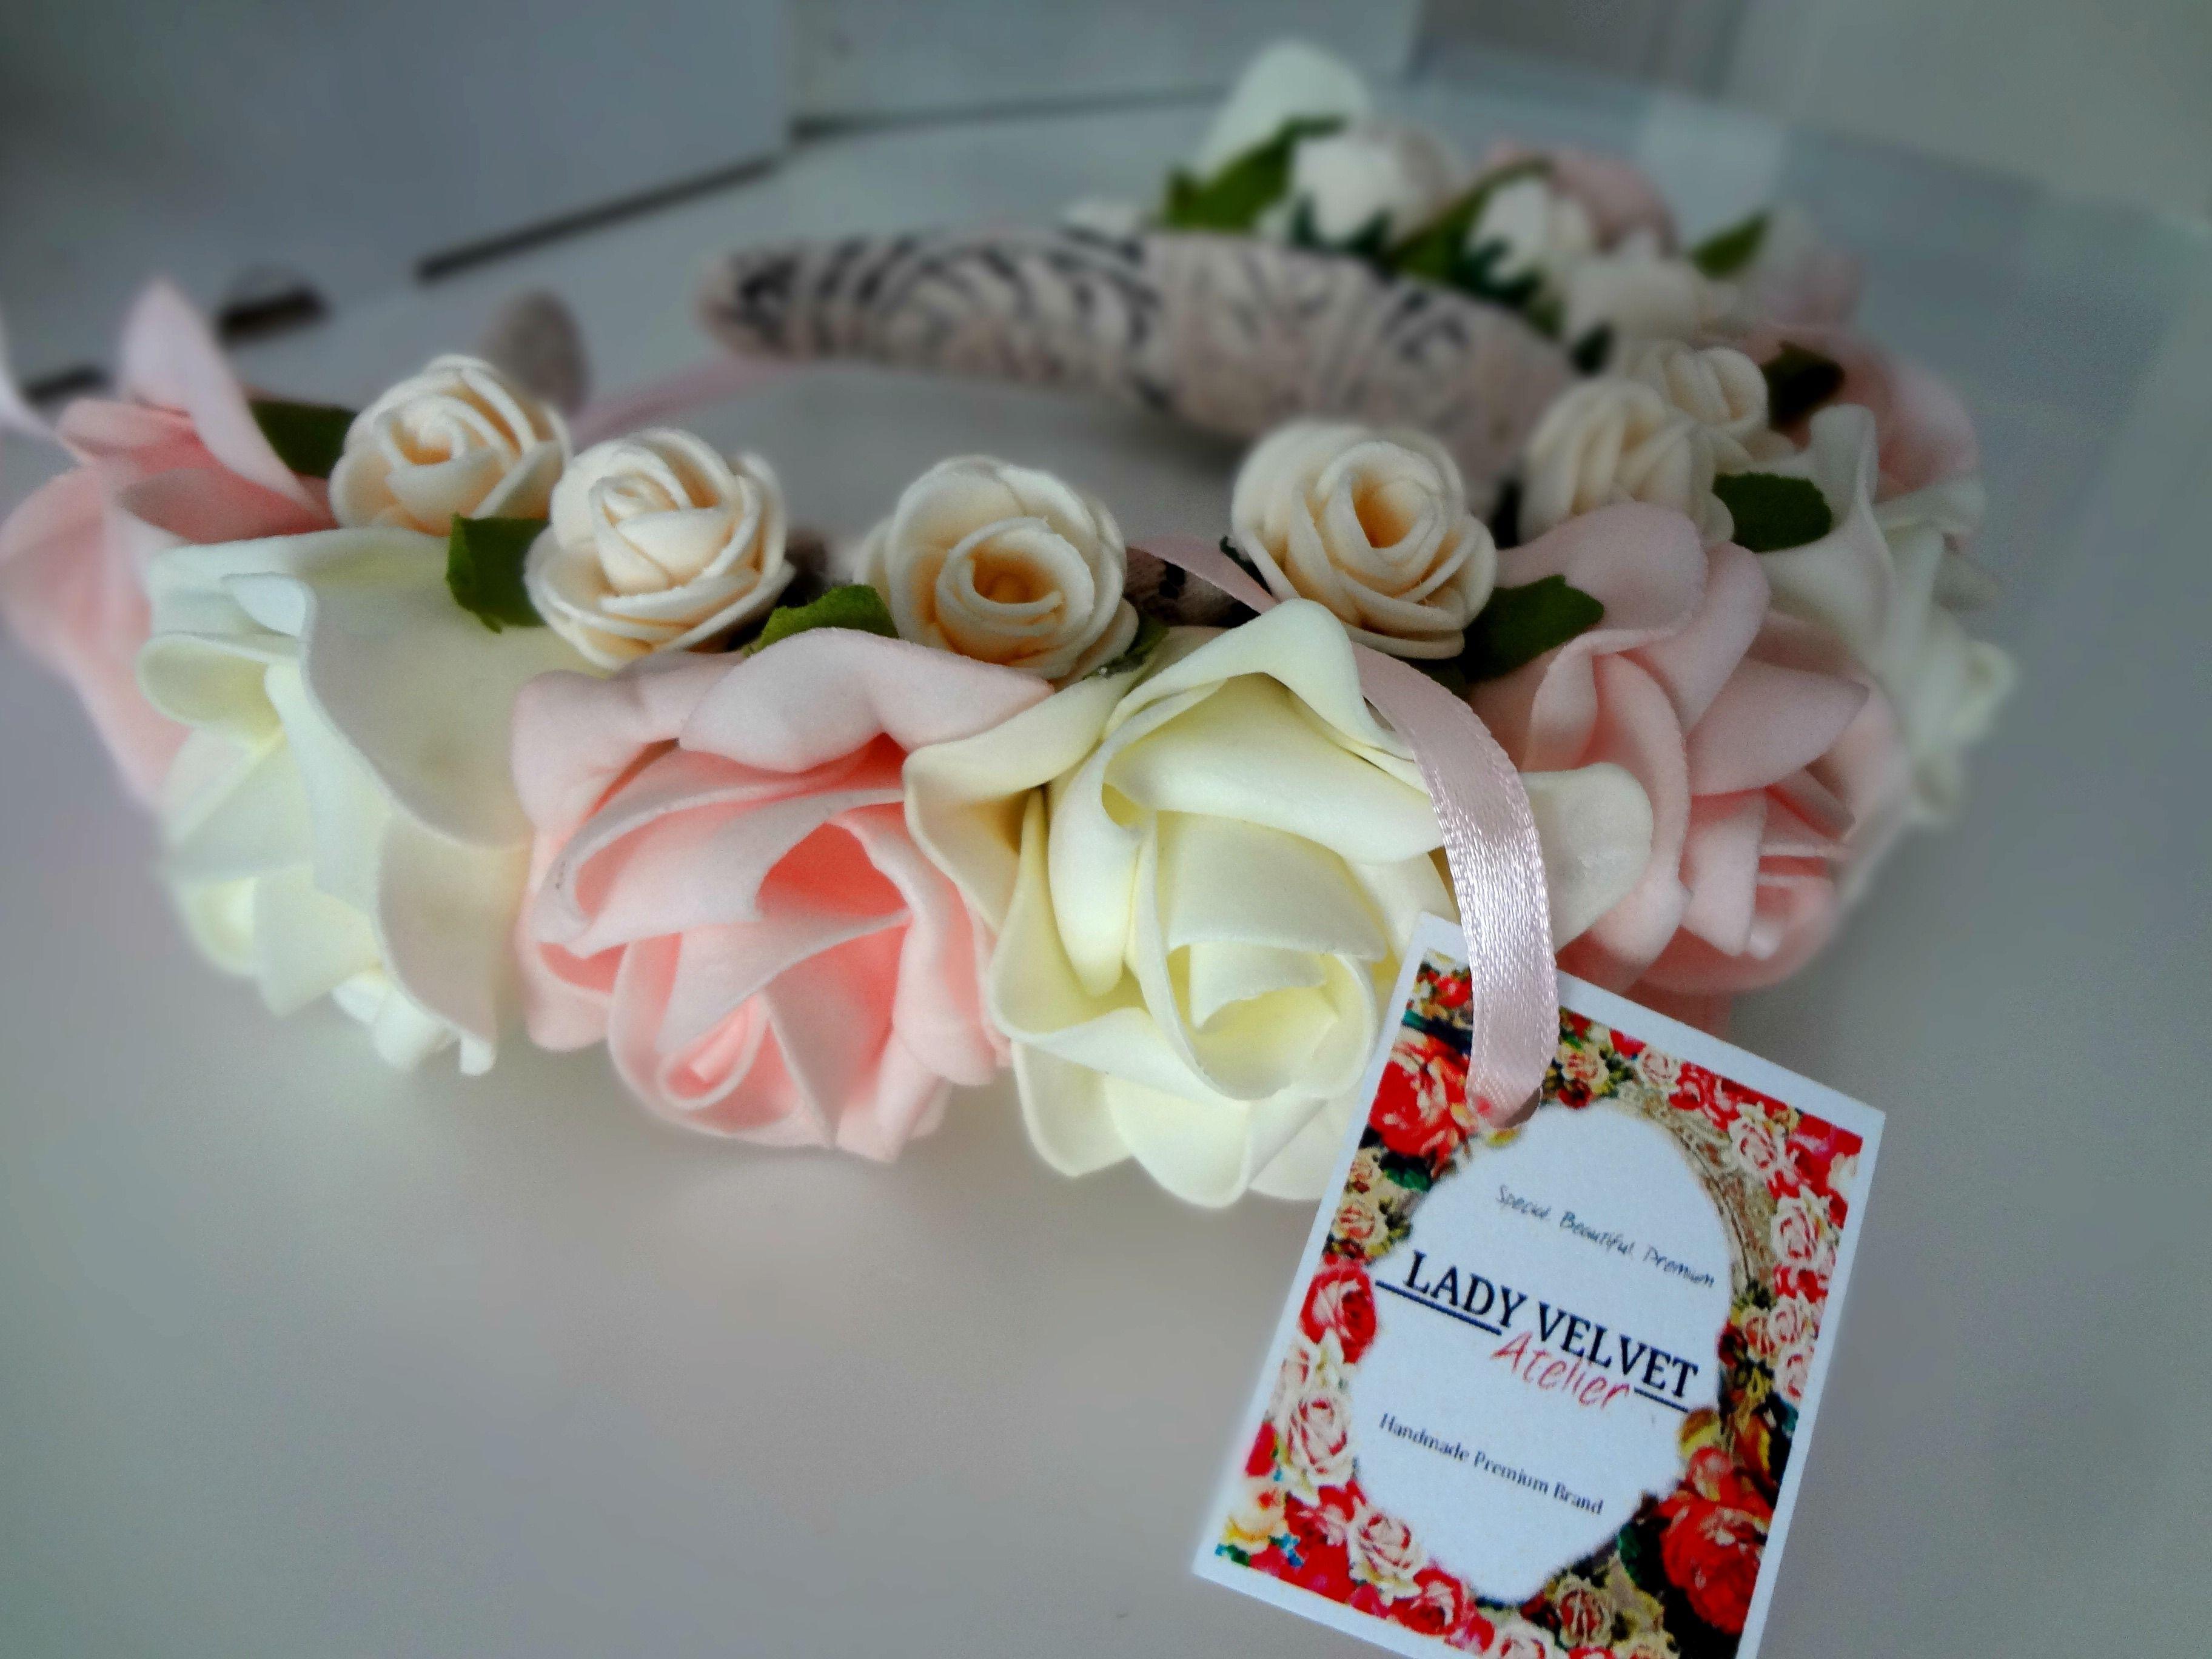 Coronesse Regal Bridal by Lady Velvet Atelier. Handmade. Made in Romania, https://www.facebook.com/media/set/?set=a.1034397376587726.1073741853.782588768435256&type=3